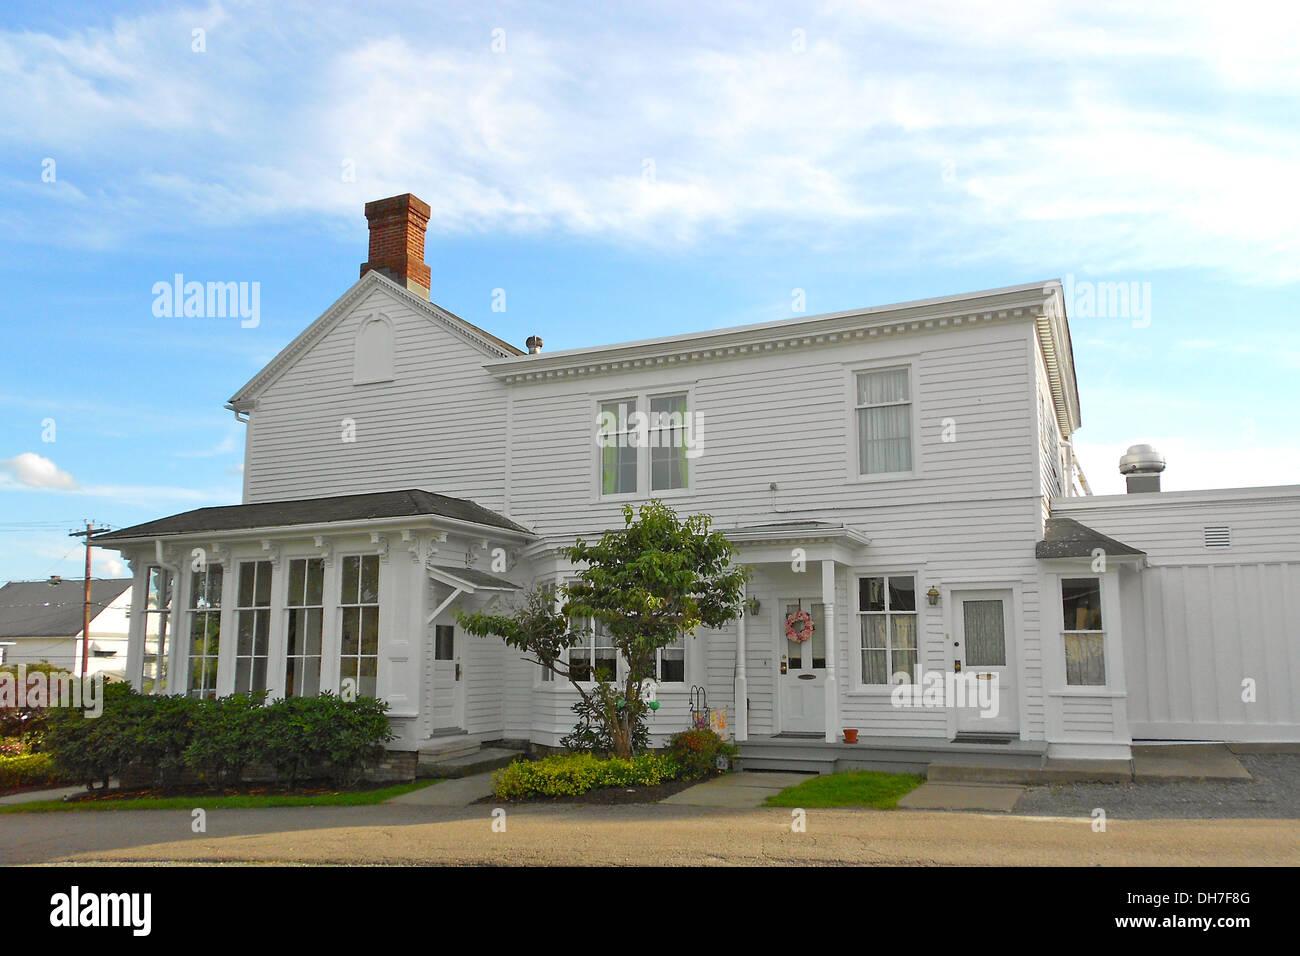 Tripp Familie Homestead genannt wird auf dem NRHP 19. Juni 1972, bei 1101 North Main Avenue, Scranton, Lackawanna County, Pennsylvani Stockbild